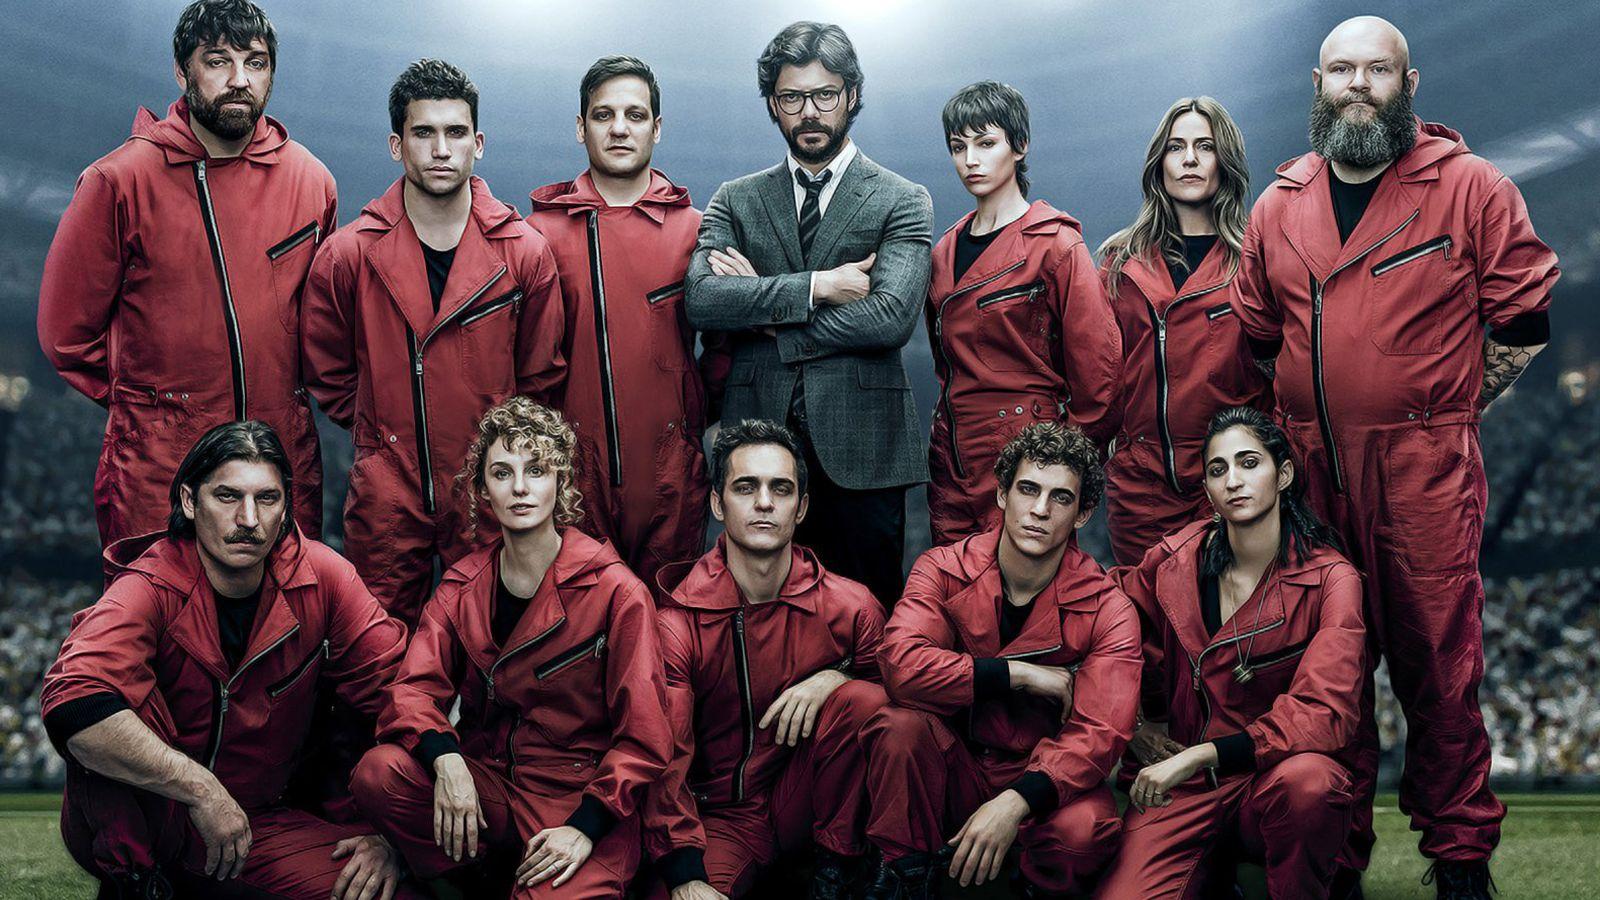 Casa de Papel season 4: Μάθετε όλες τις εξελίξεις πριν την πρεμιέρα [vid]